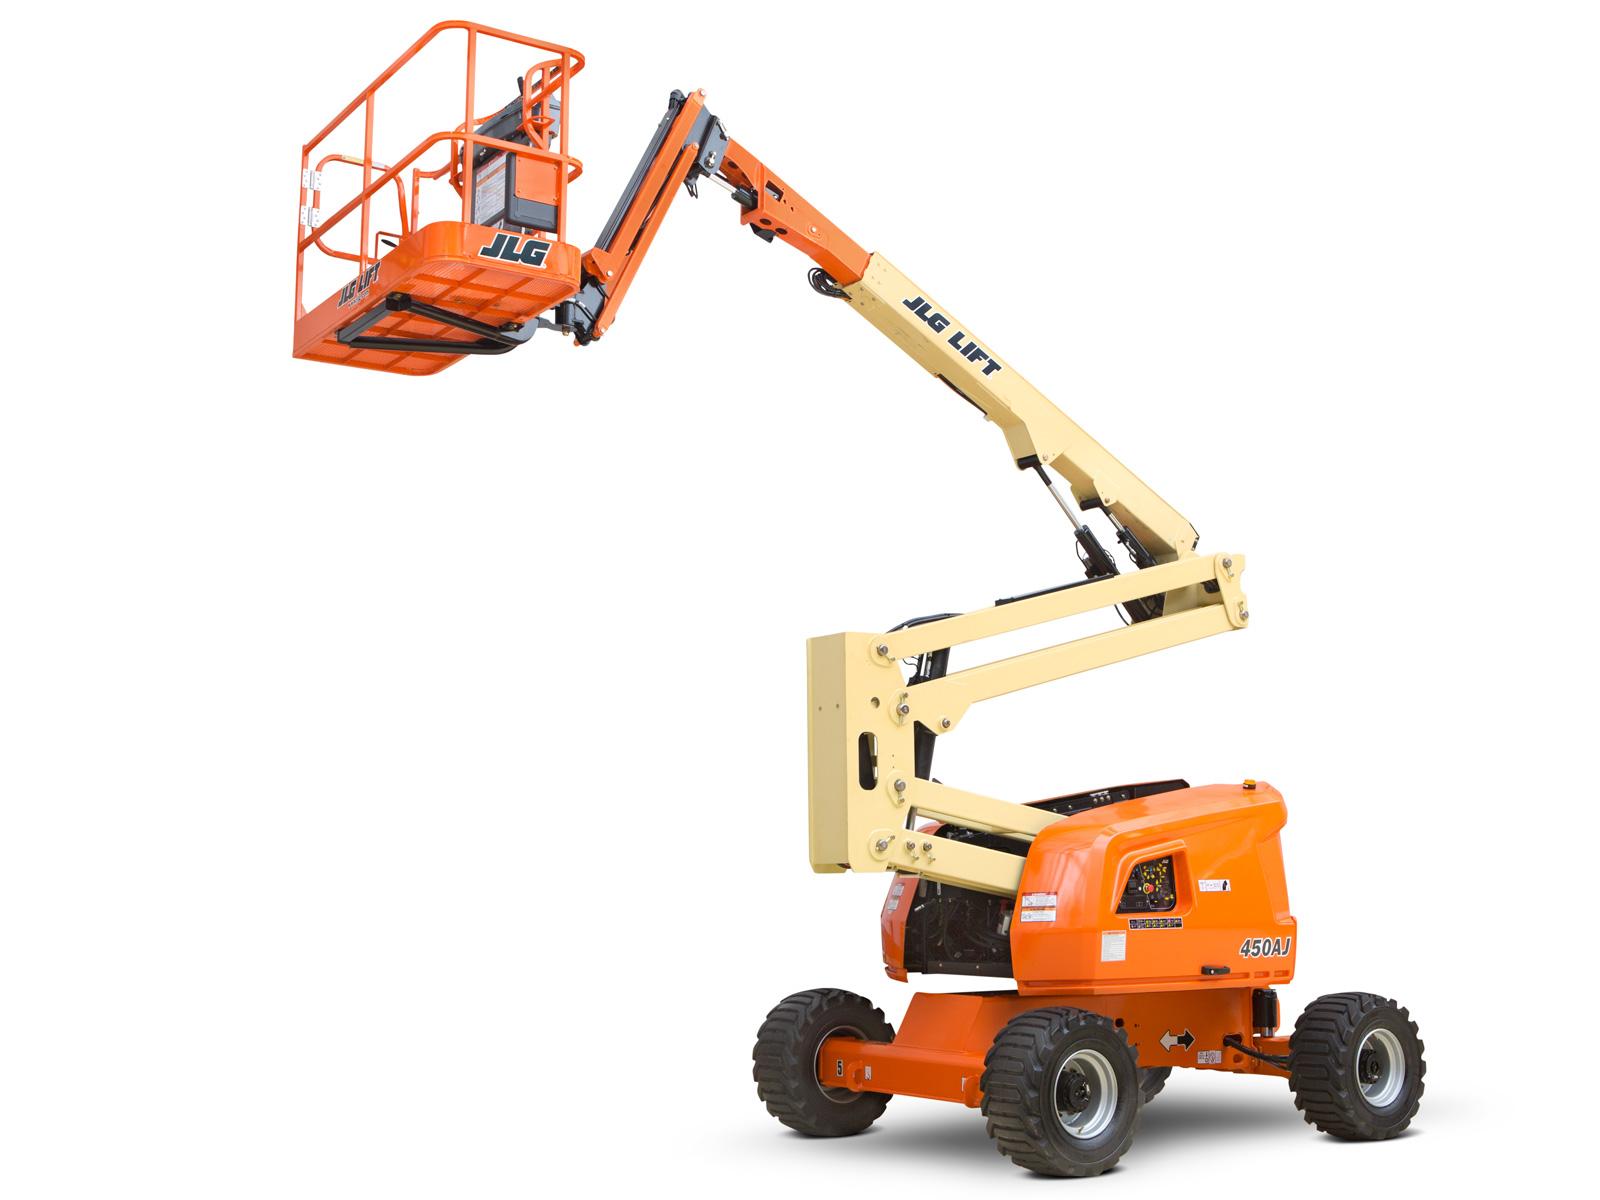 450AJ Articulating Boom Lift | JLG on